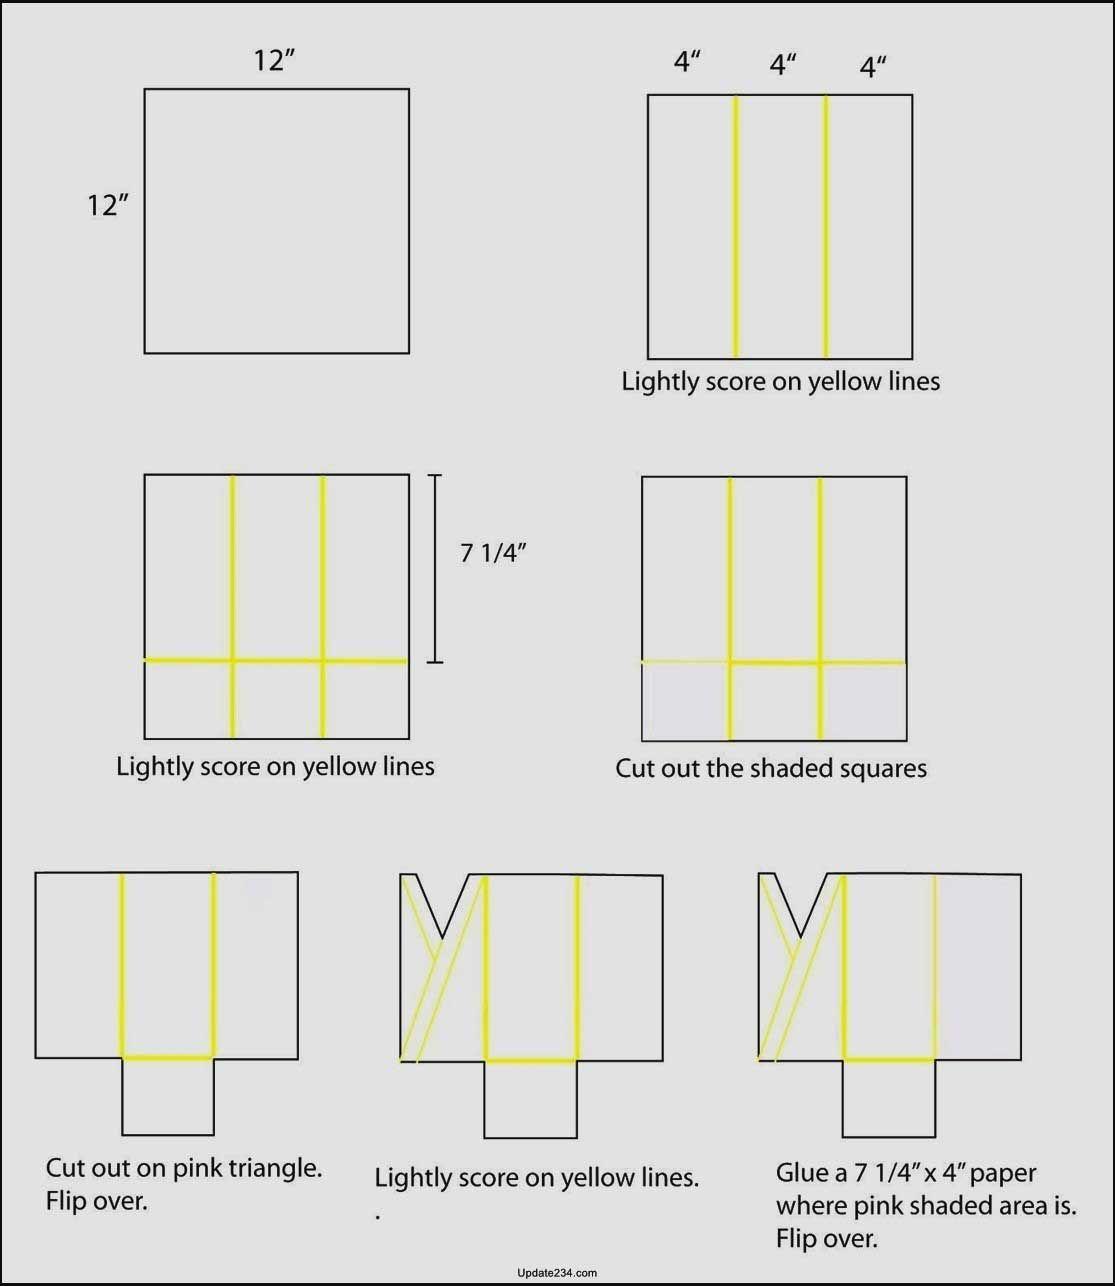 003 Quarter Fold Card Template Word Free Wonderful Ideas With Blank Quarter Fold Card Template Callforpci Card Templates Free Card Template Business Template